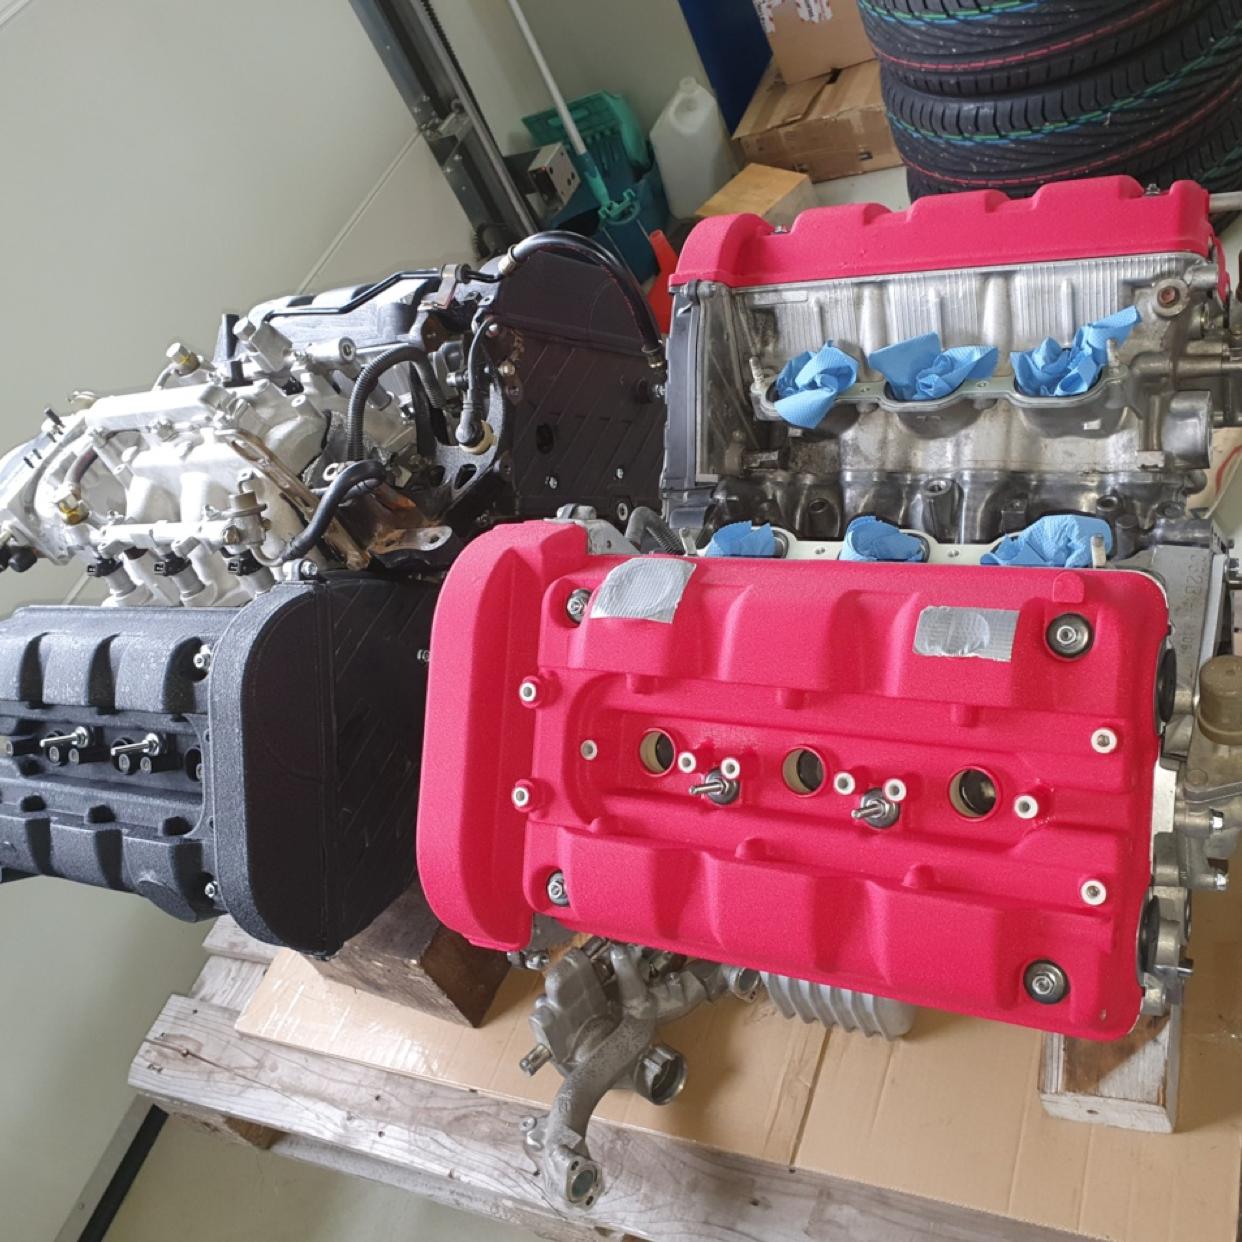 NSX Carbon Parts For Honda / Acura